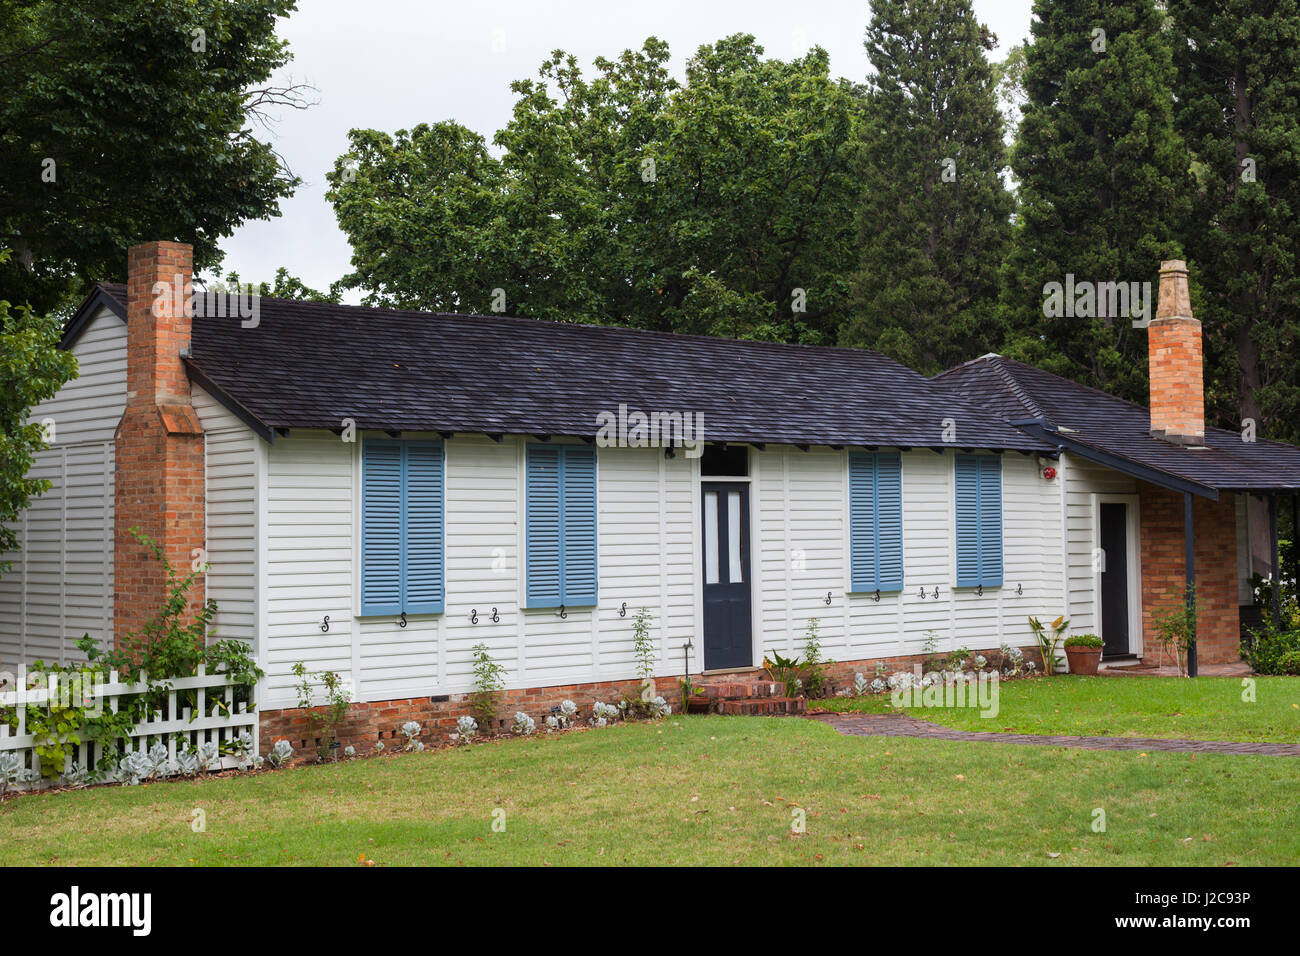 Australien, Victoria, Melbourne, Kings Domain Gouverneur La Trobe Cottage, original Regierungsgebäude von England Stockbild